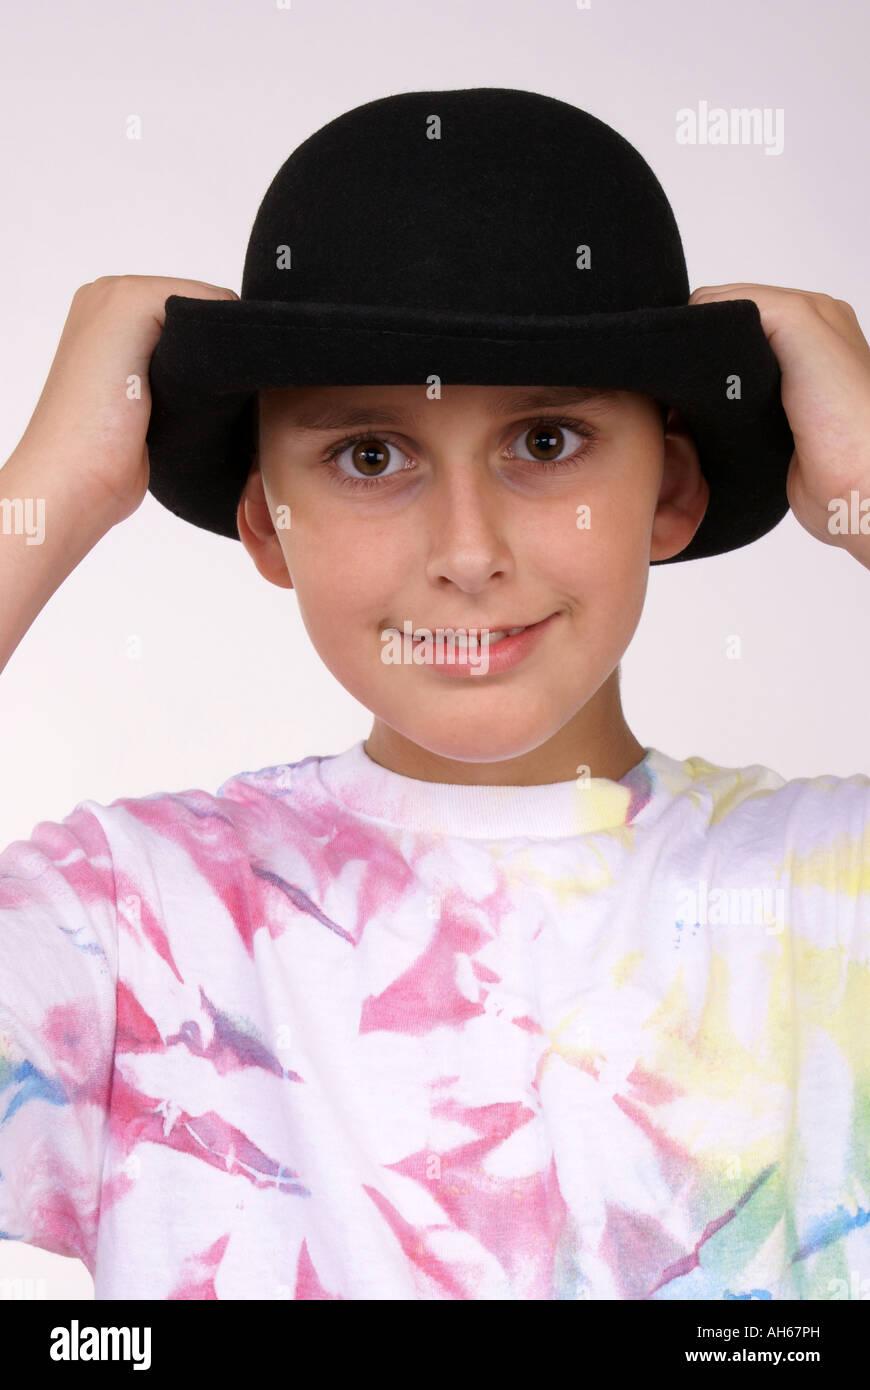 4a6a076e Put on Hat Stock Photo: 14371768 - Alamy